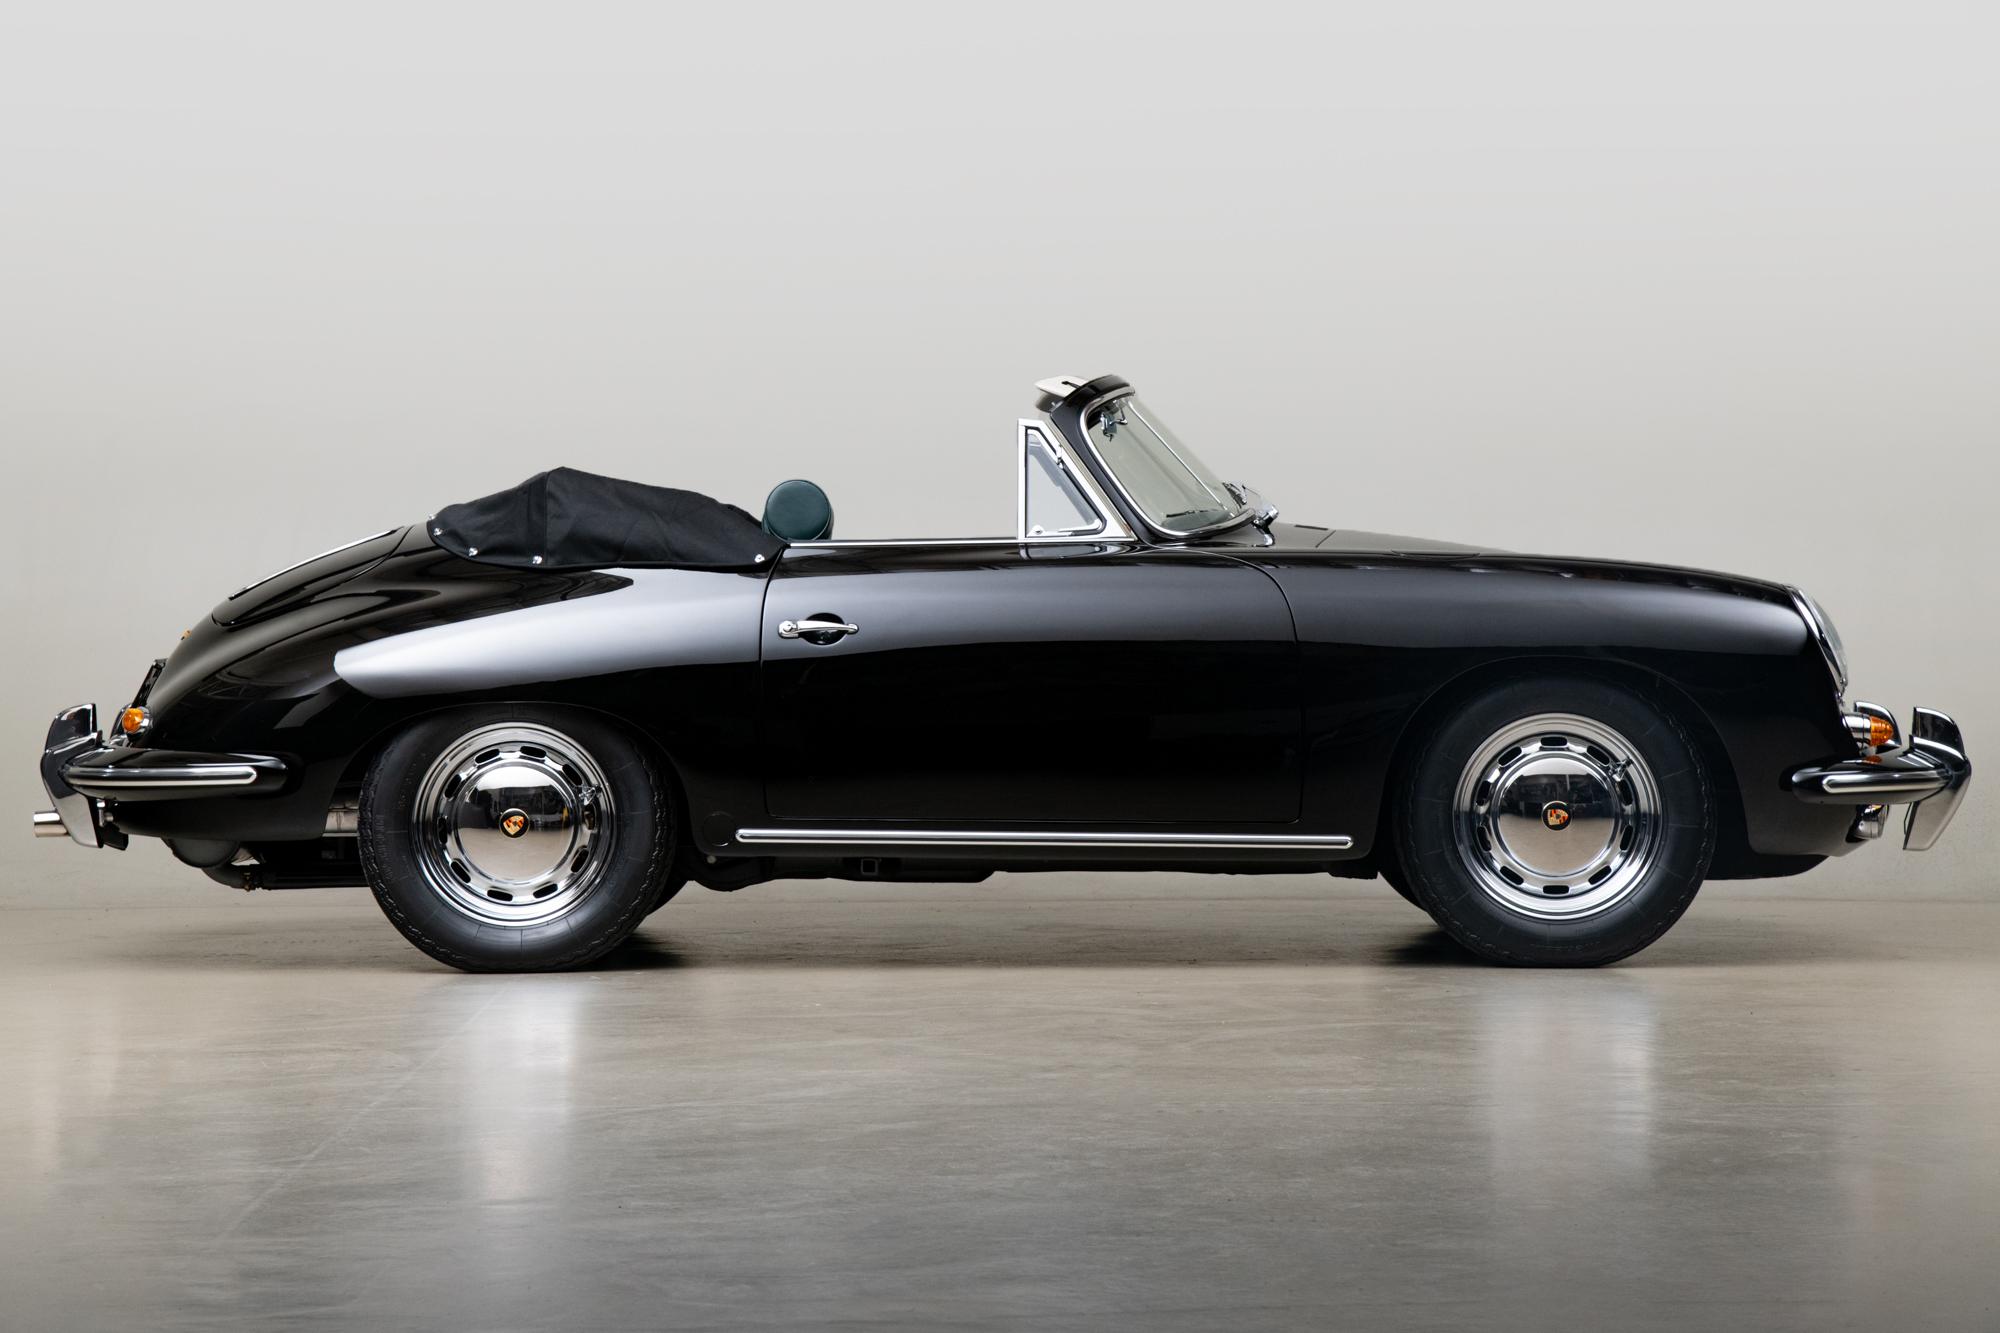 1965 Porsche 356SC Cabriolet , BLACK, VIN 161052, MILEAGE 98799